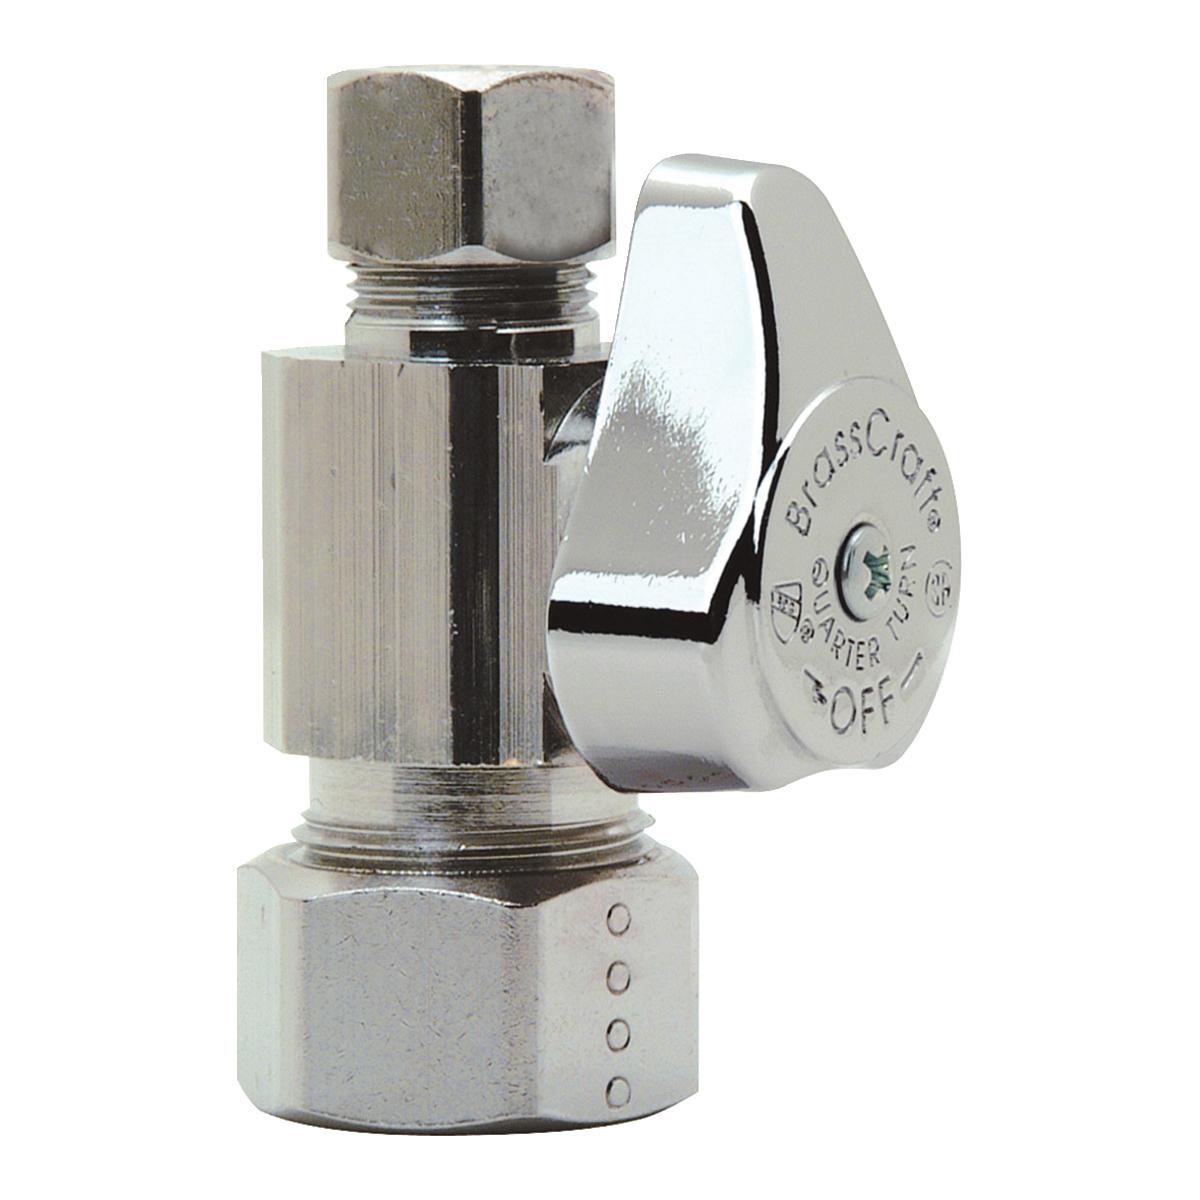 BrassCraft® G2CR14XC Brass Straight Supply Stop Valve, 1/2 in x 3/8 in, Compression, 125 psi, 40 - 140 deg F